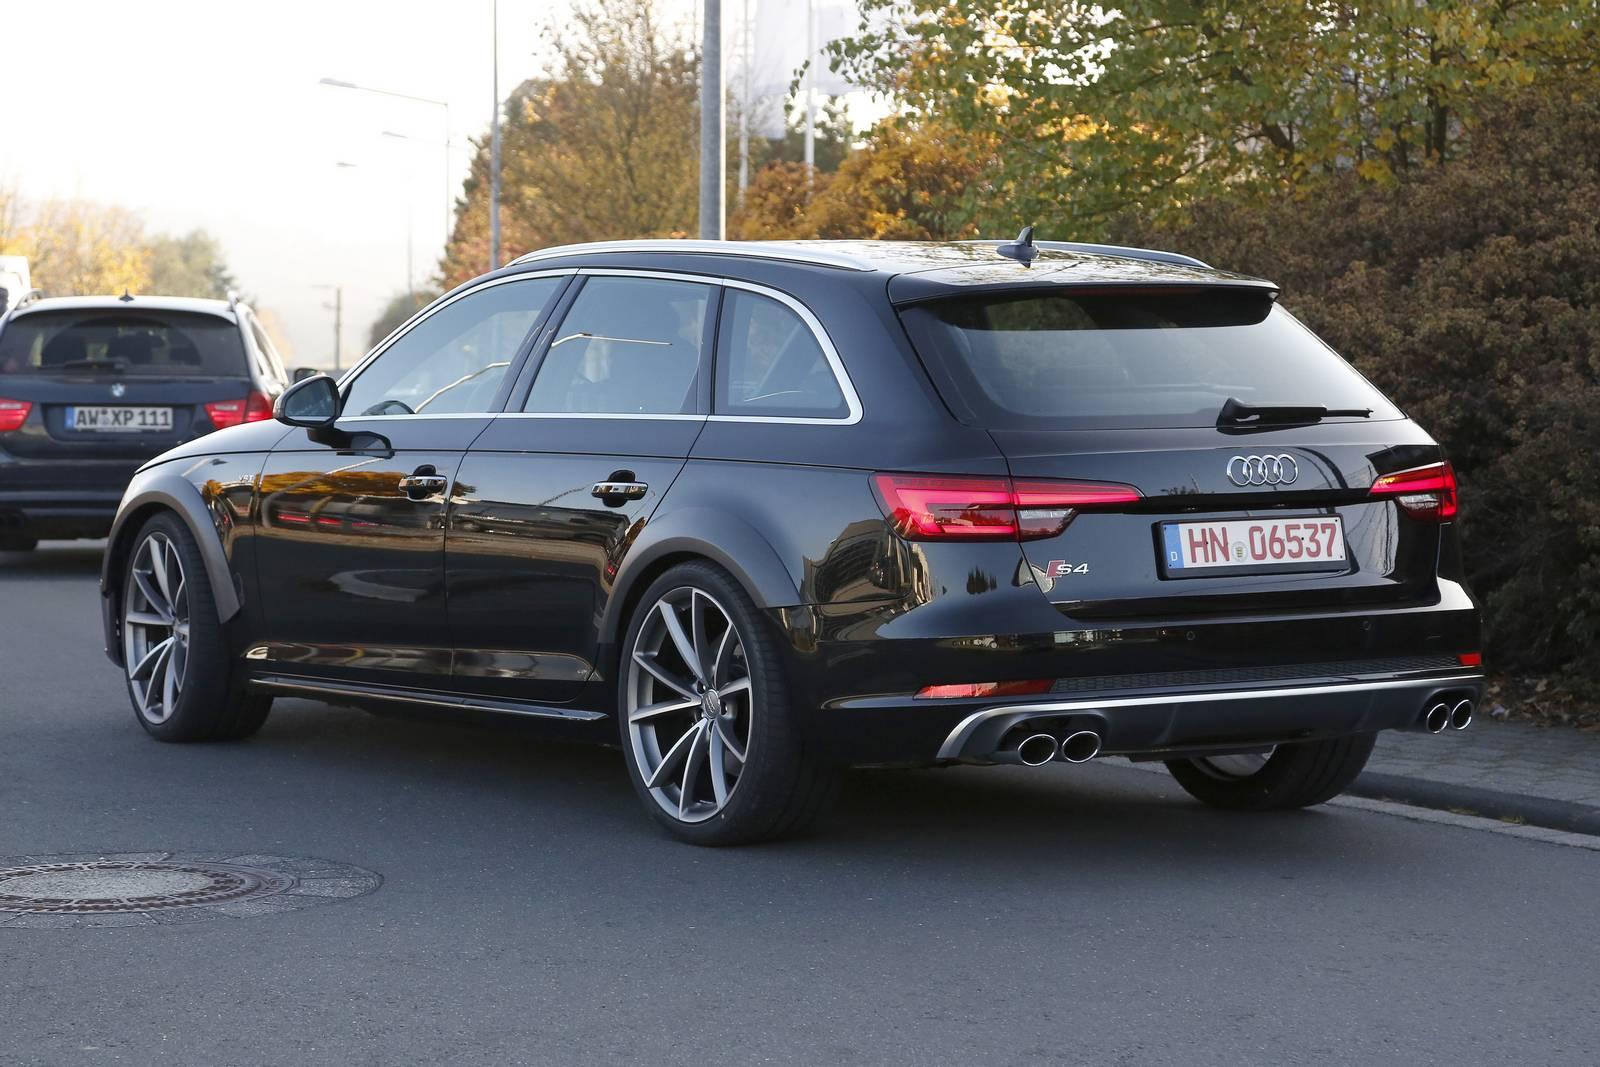 Audi a4 avant 2014 owners manual 6